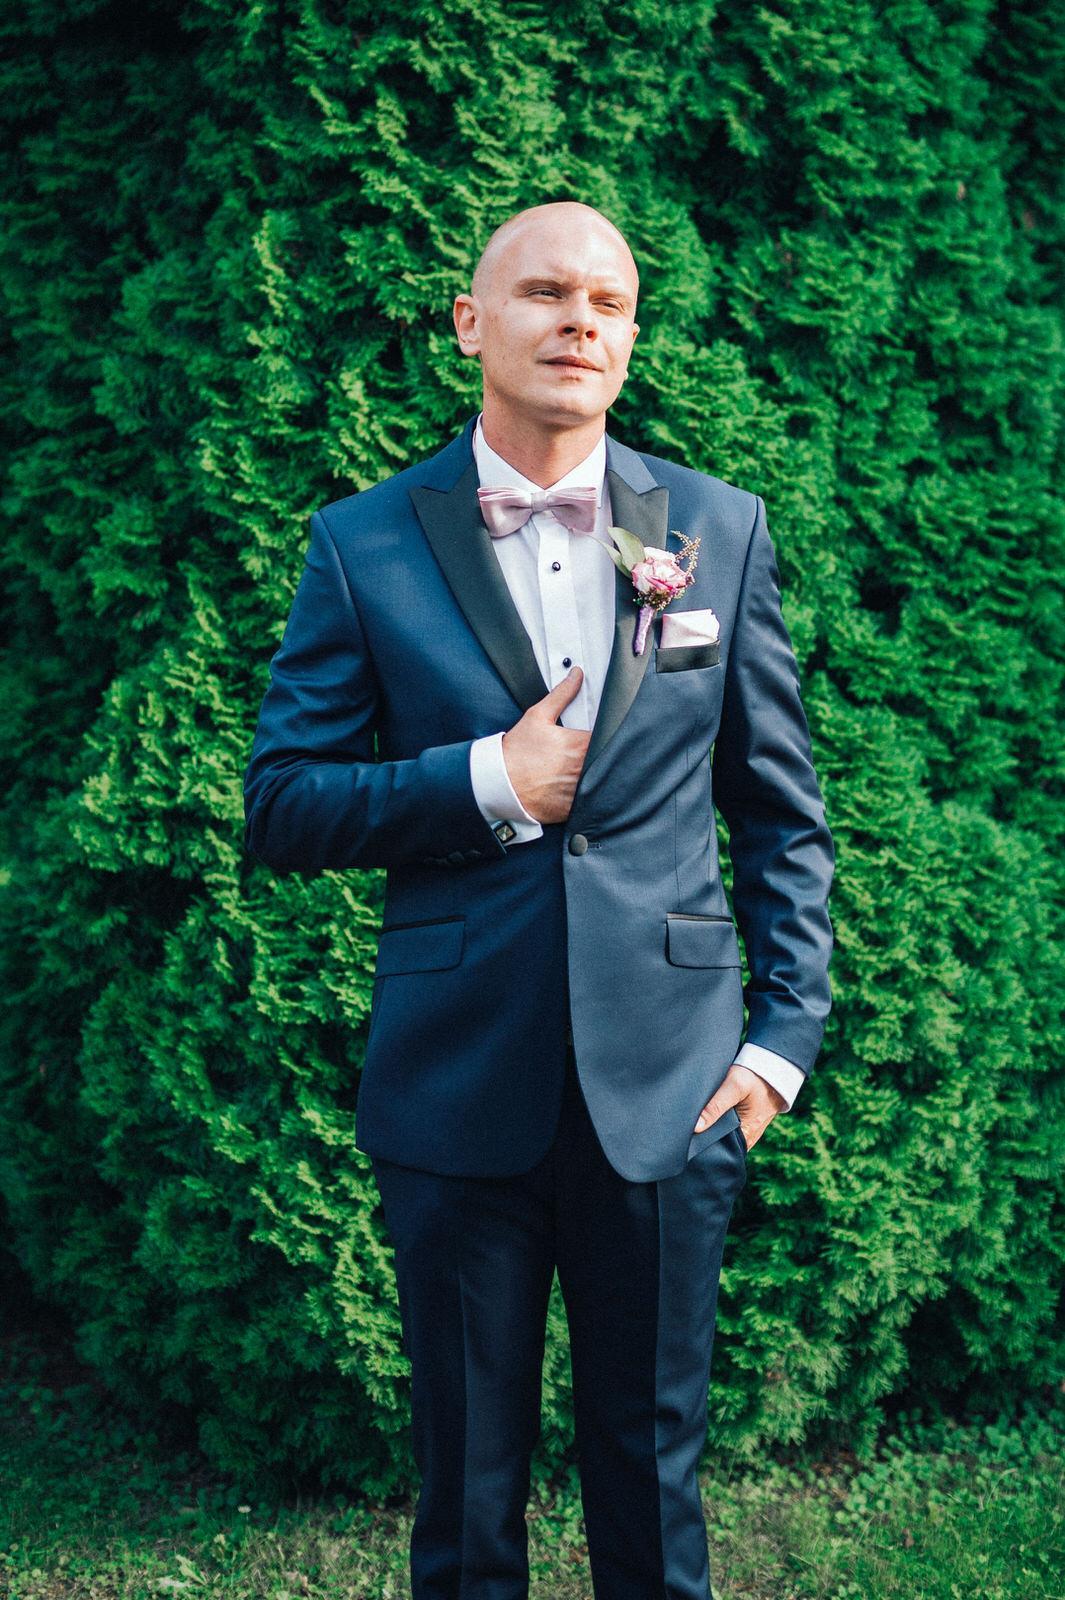 Slub Karczma Goralska Apart Kacper Ksykiewicz Fotograf Slubny